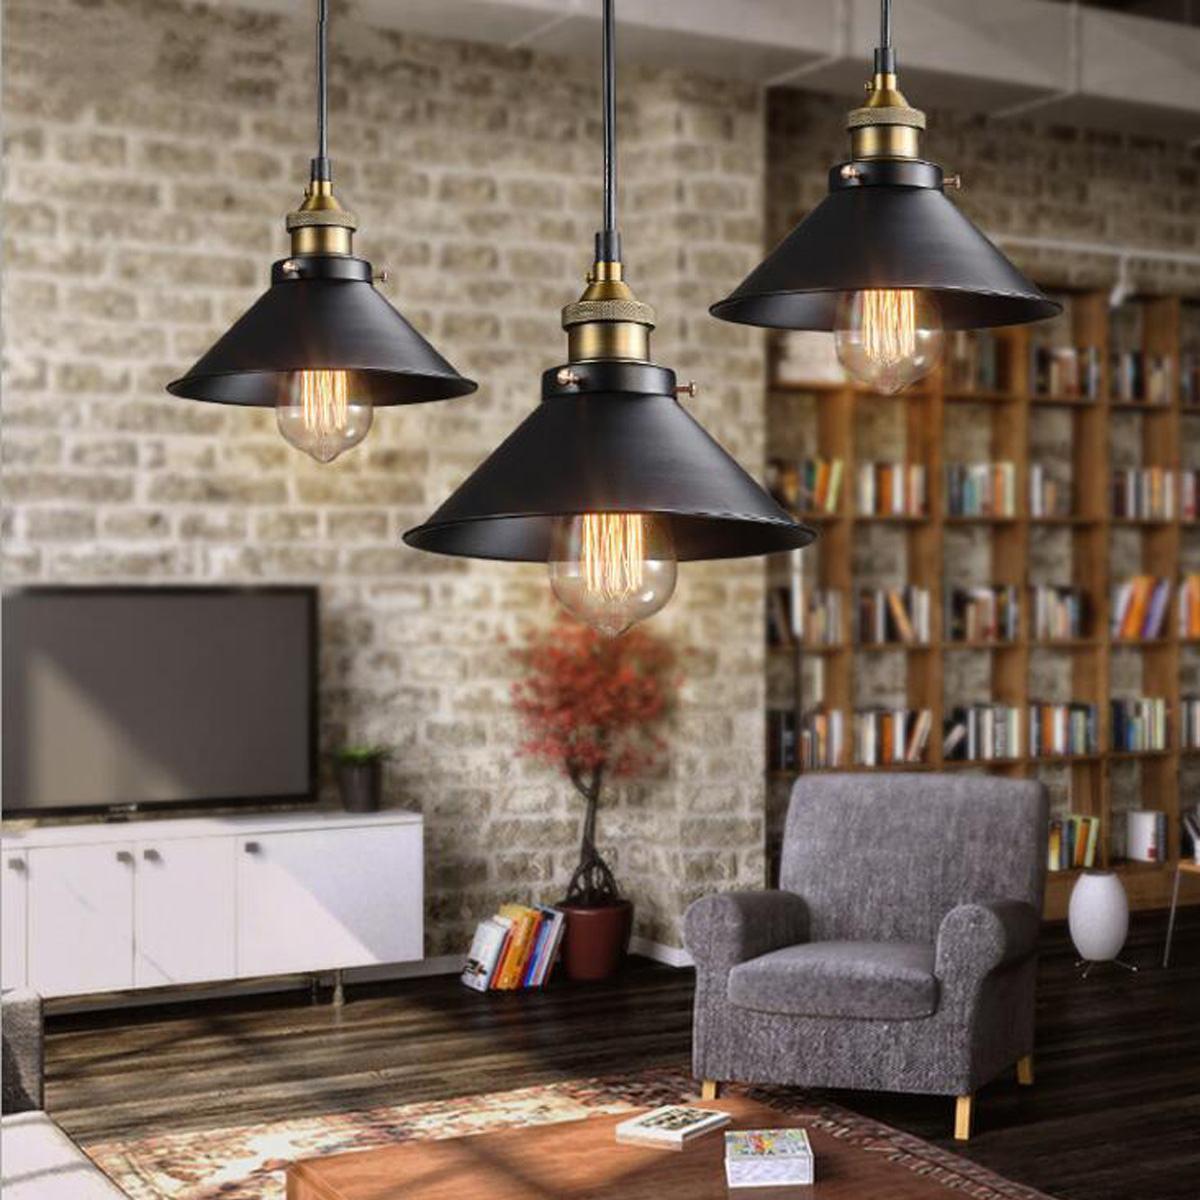 Nordic Vintage Pendant Light Industrial Retro Iron Lights Loft Edison Hanging Lamp Cafe Bar Kitchen Dining Home Lighting Fixture